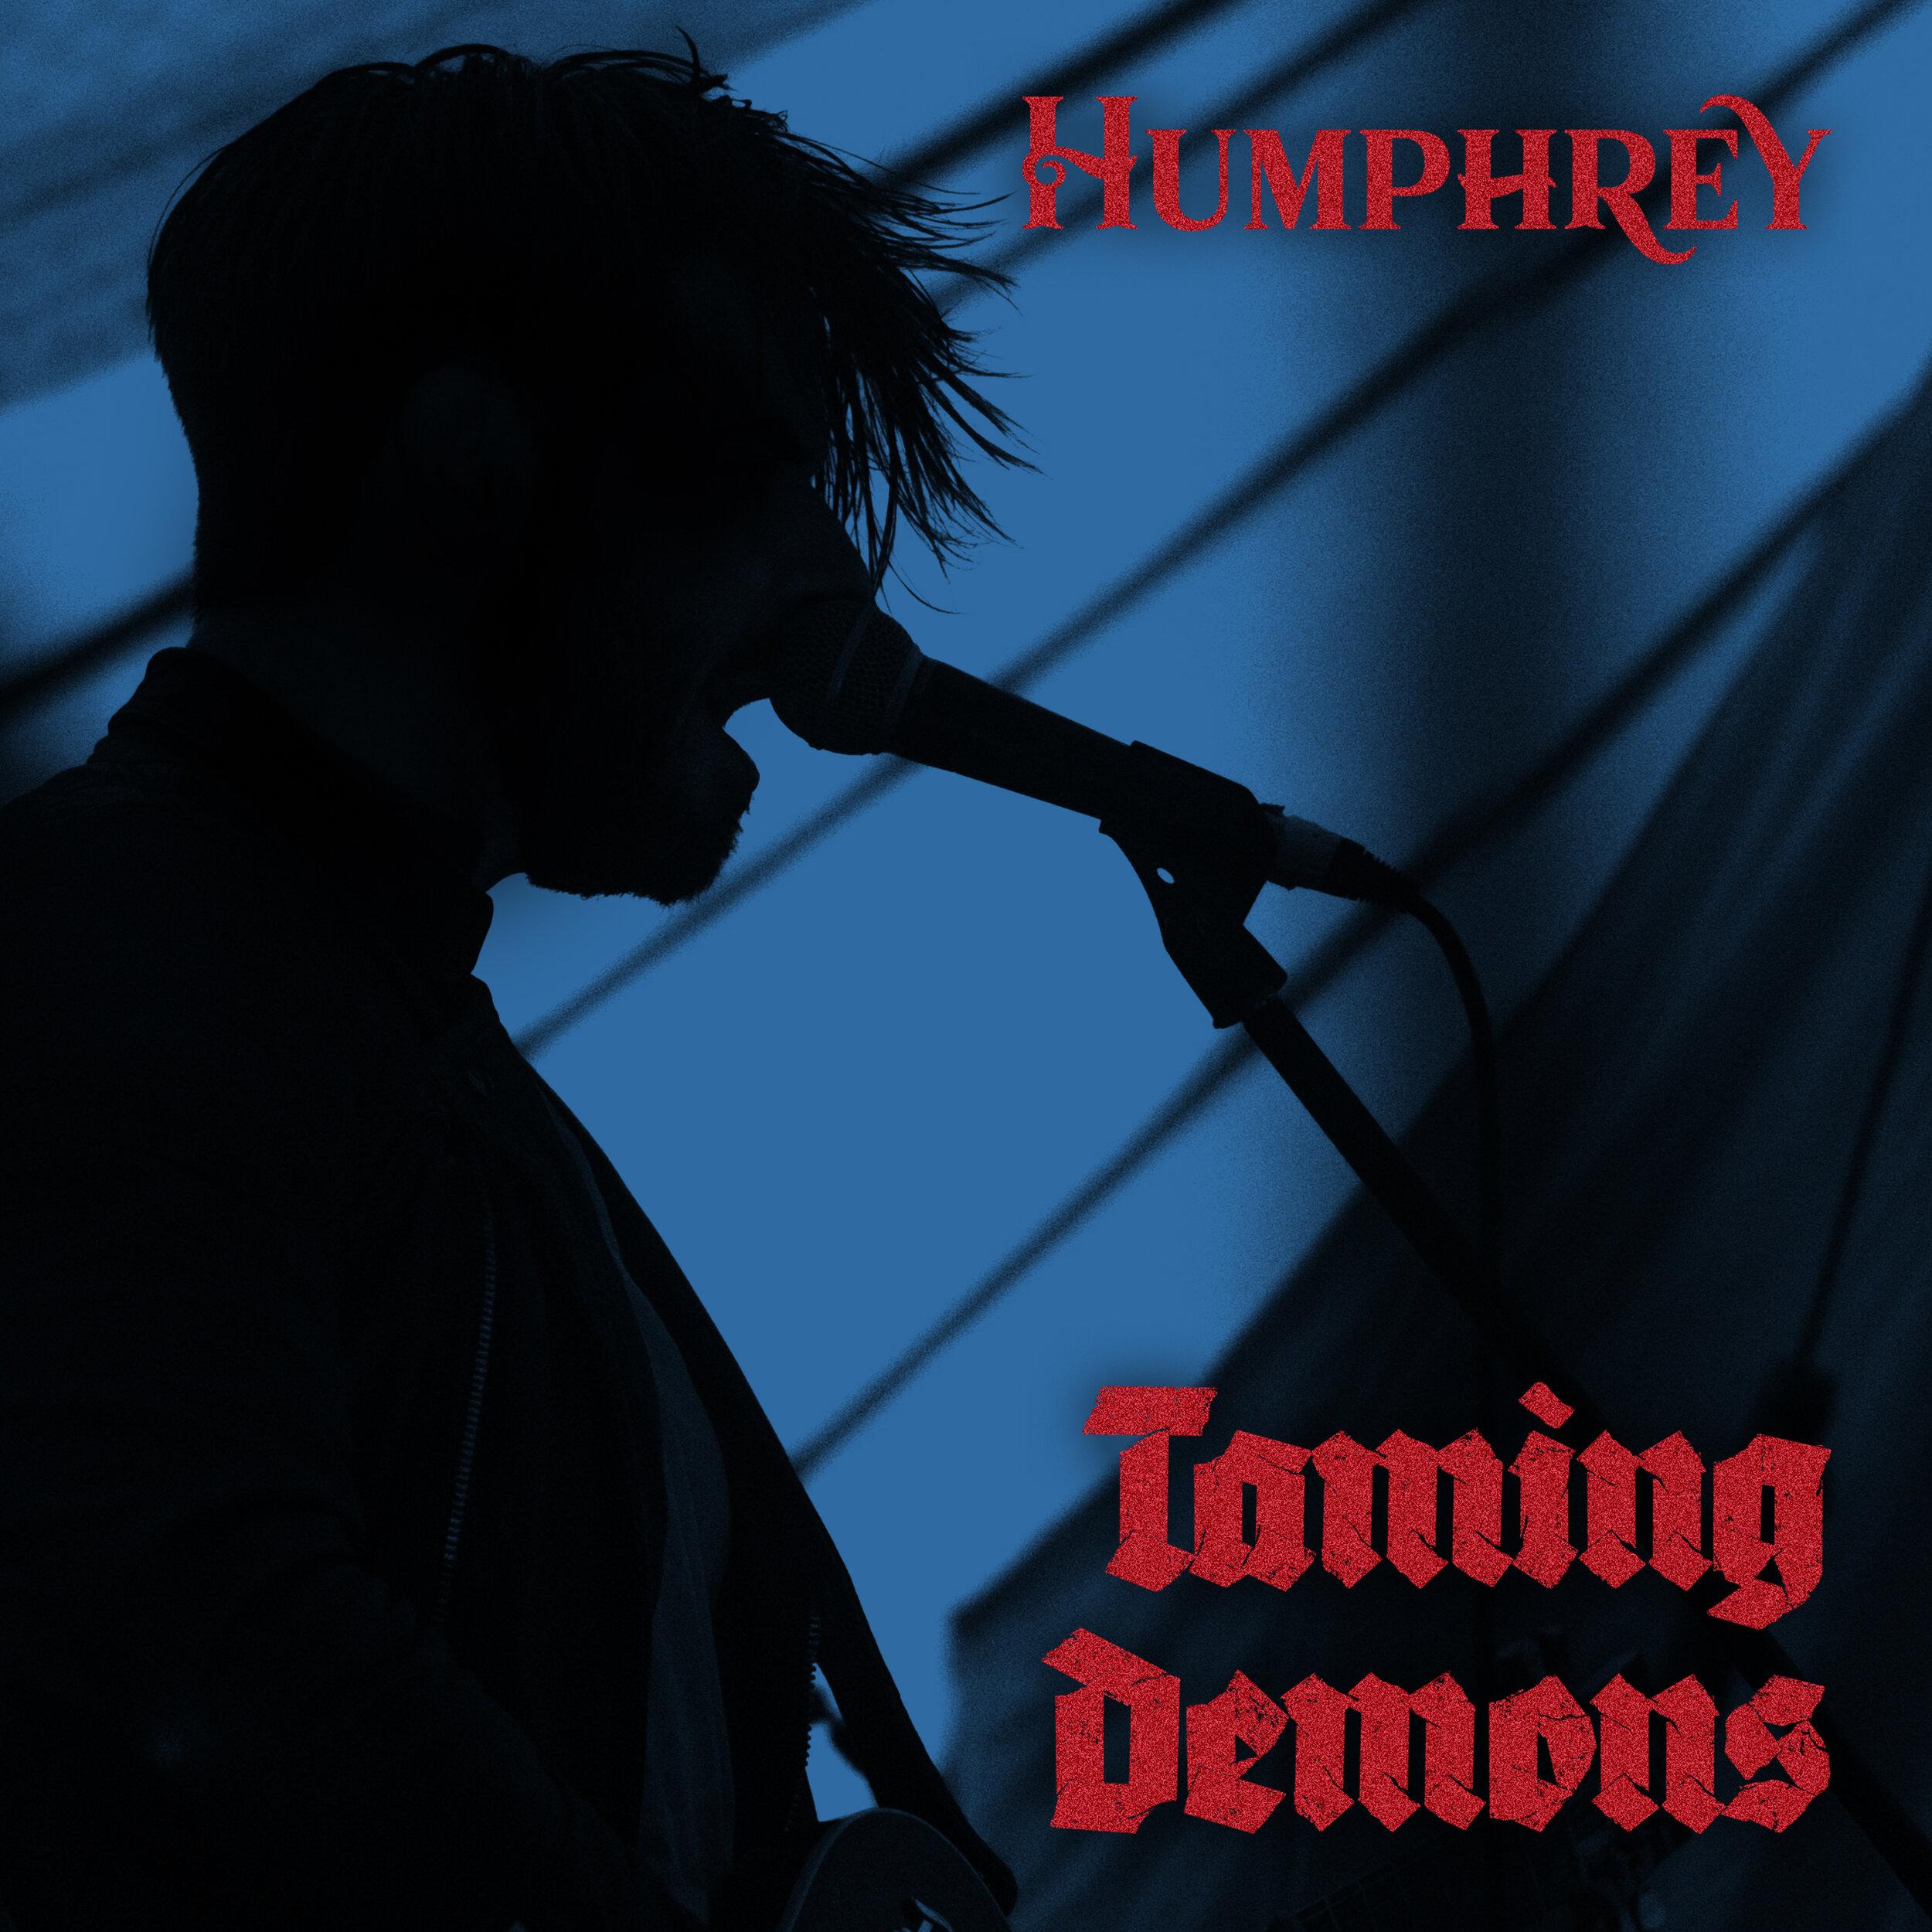 Humphrey_Taming_Demons_V2.jpg